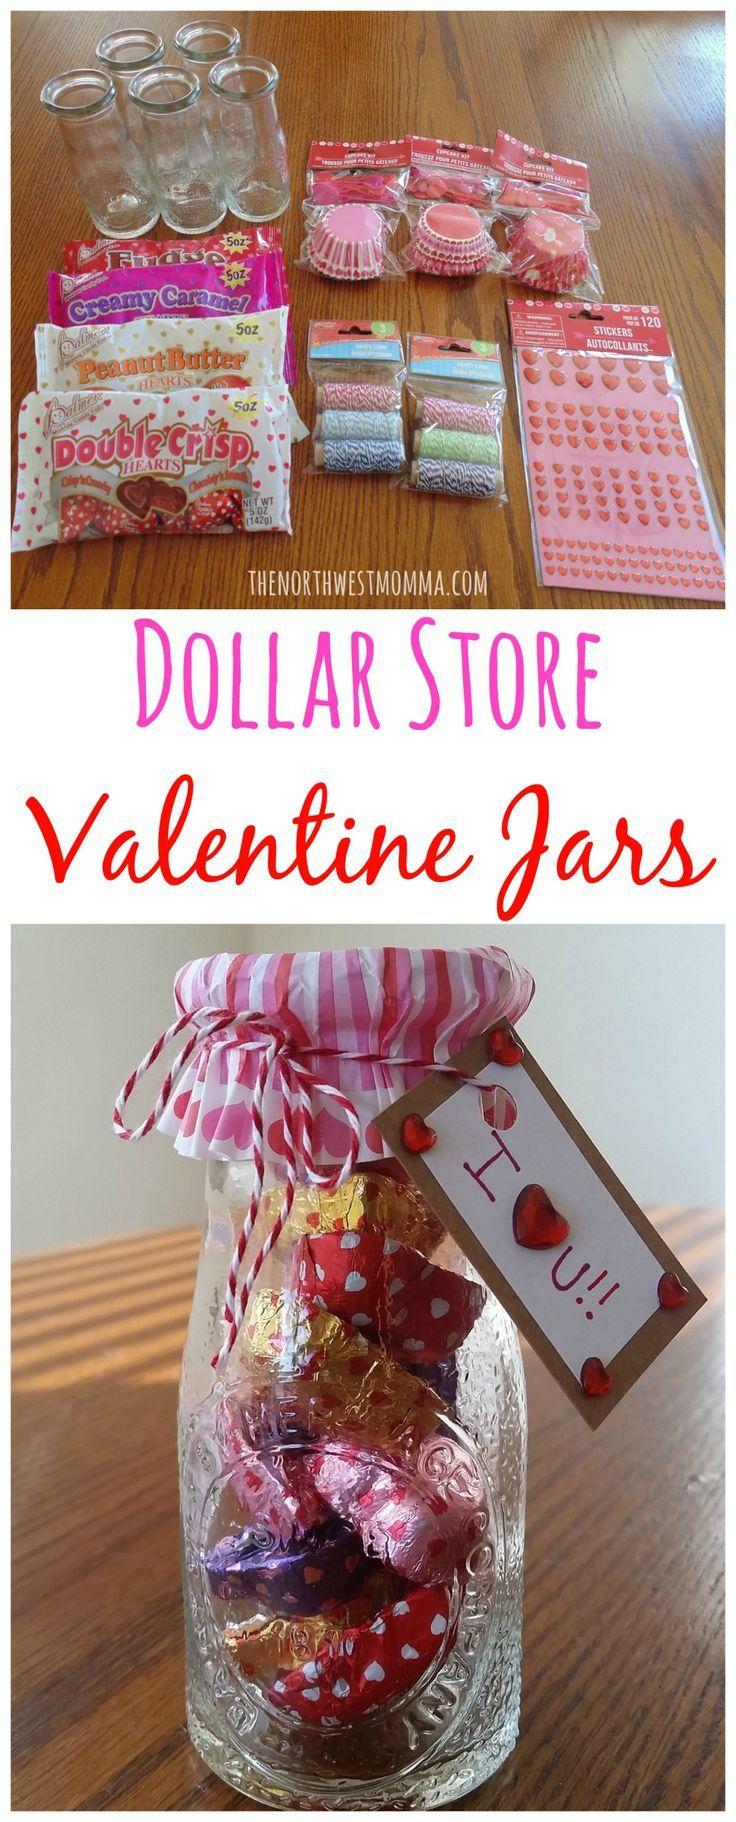 Dollar Store Valentine Jars!